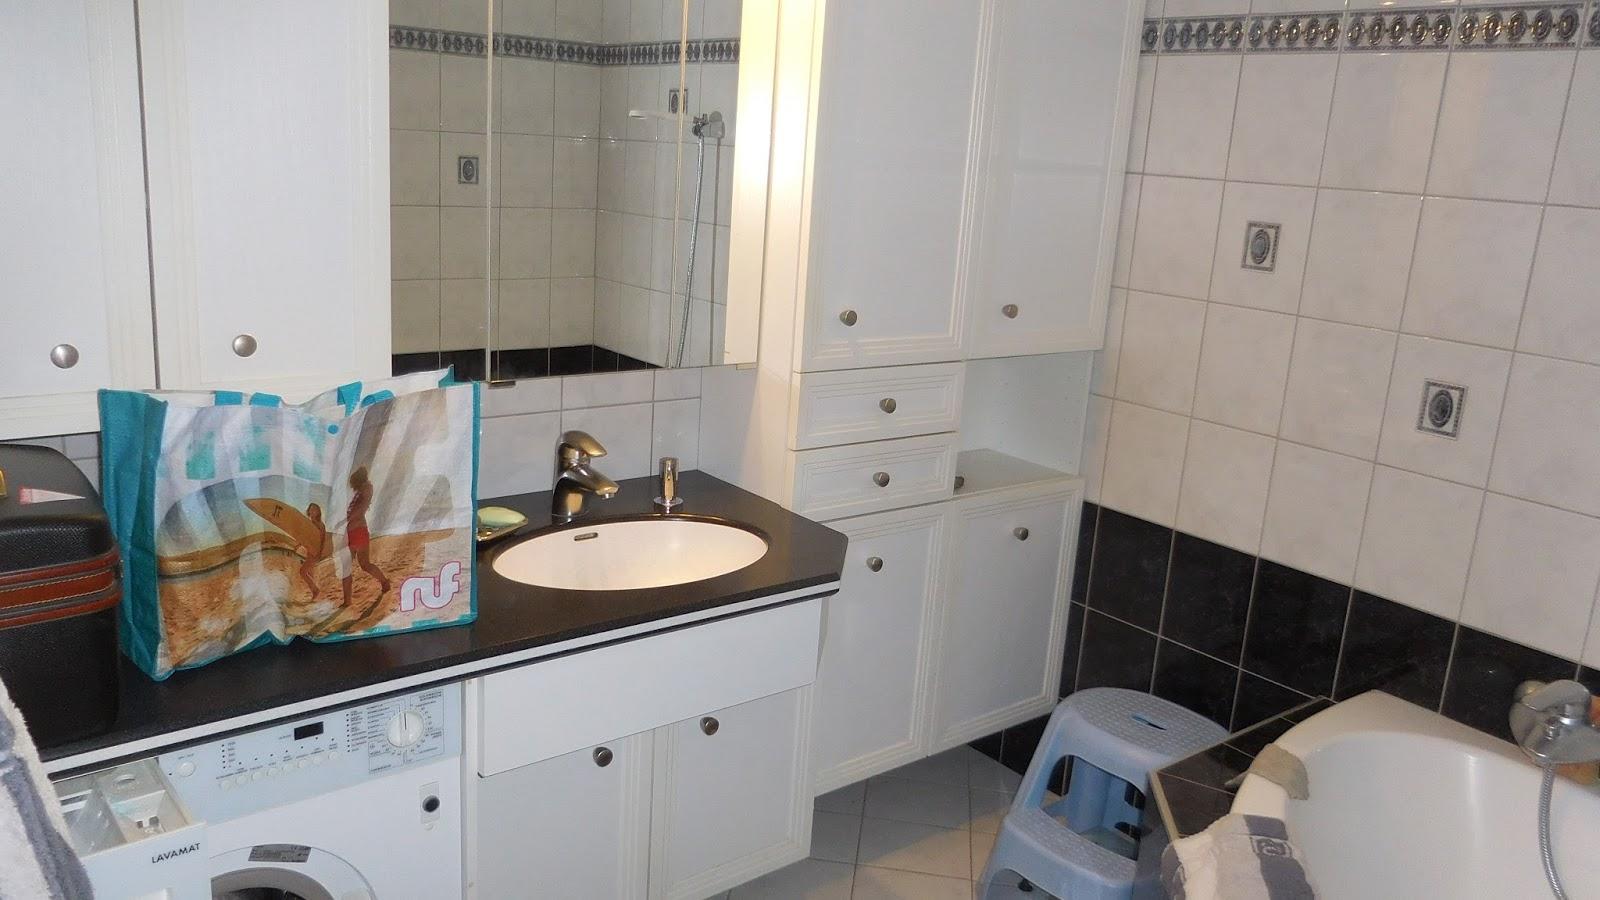 Schroli´s Baublog: Umzug Start 23. Dezember 14.00 Uhr: Badezimmer